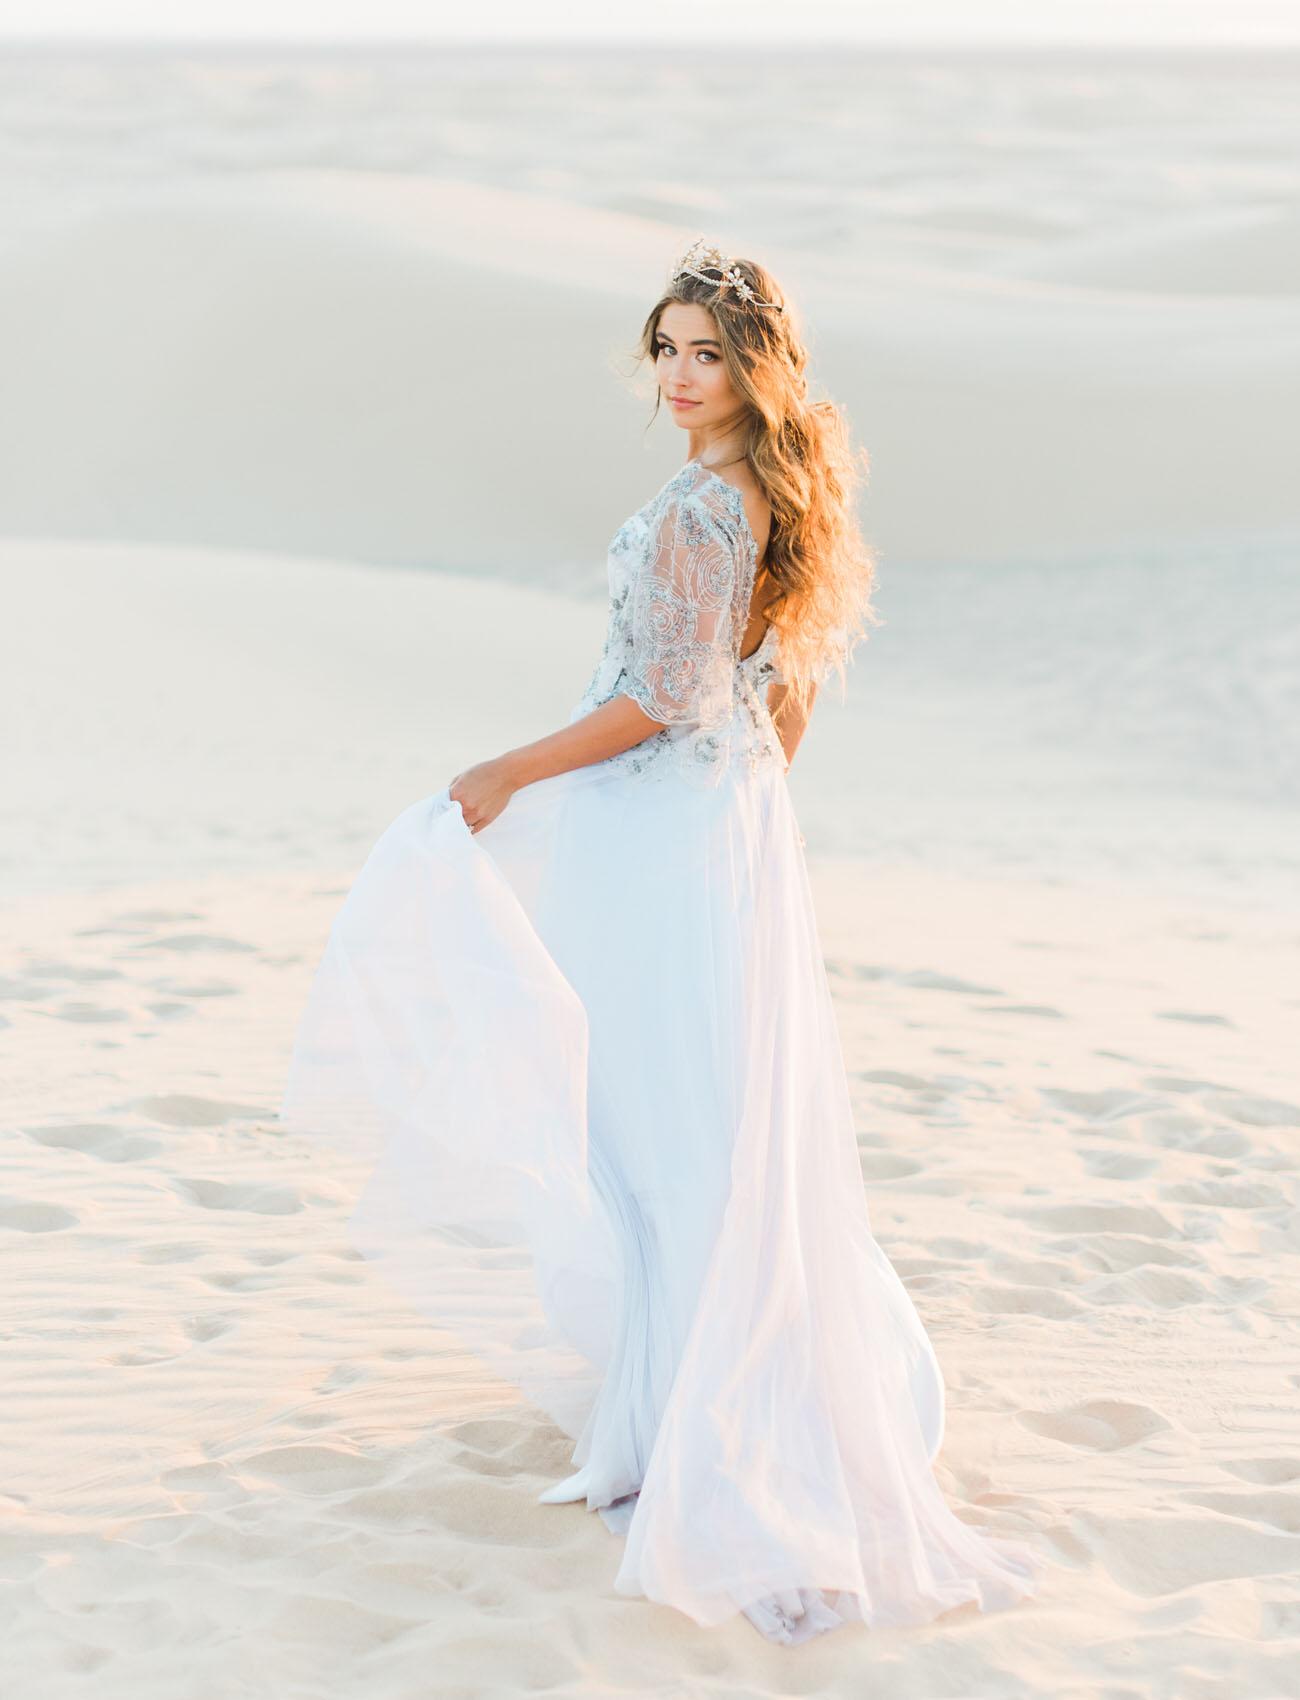 Natalie Wynn Designs Dress